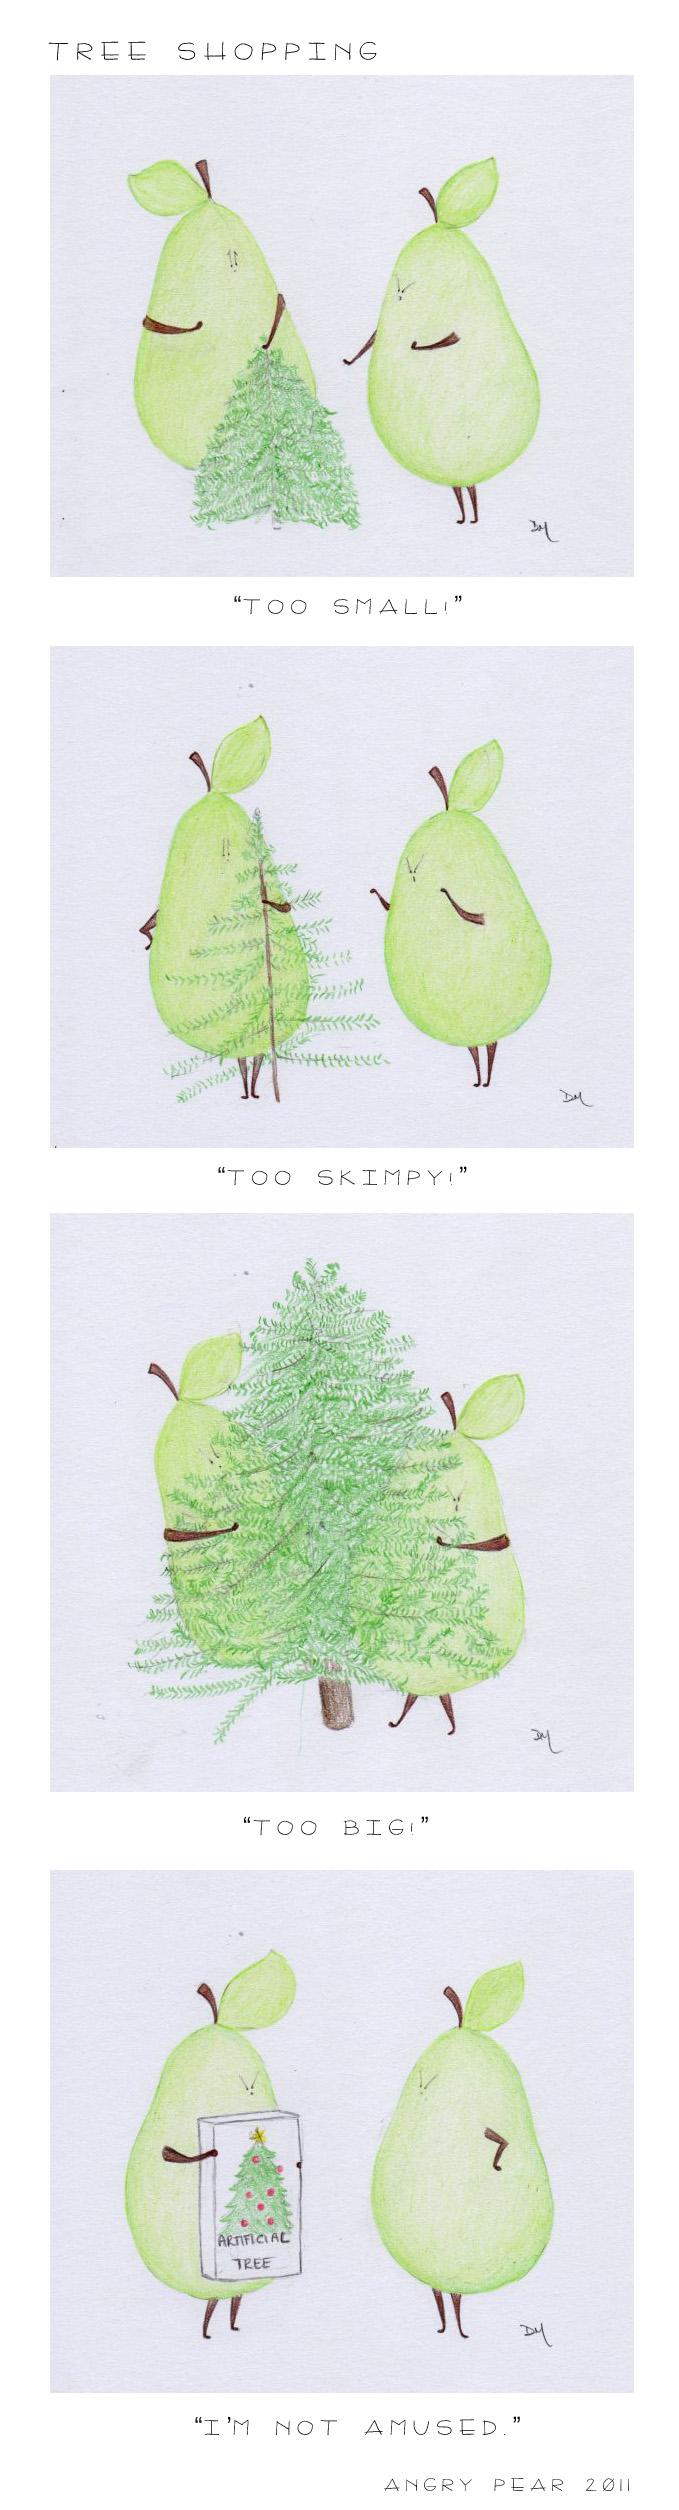 tree shopping full